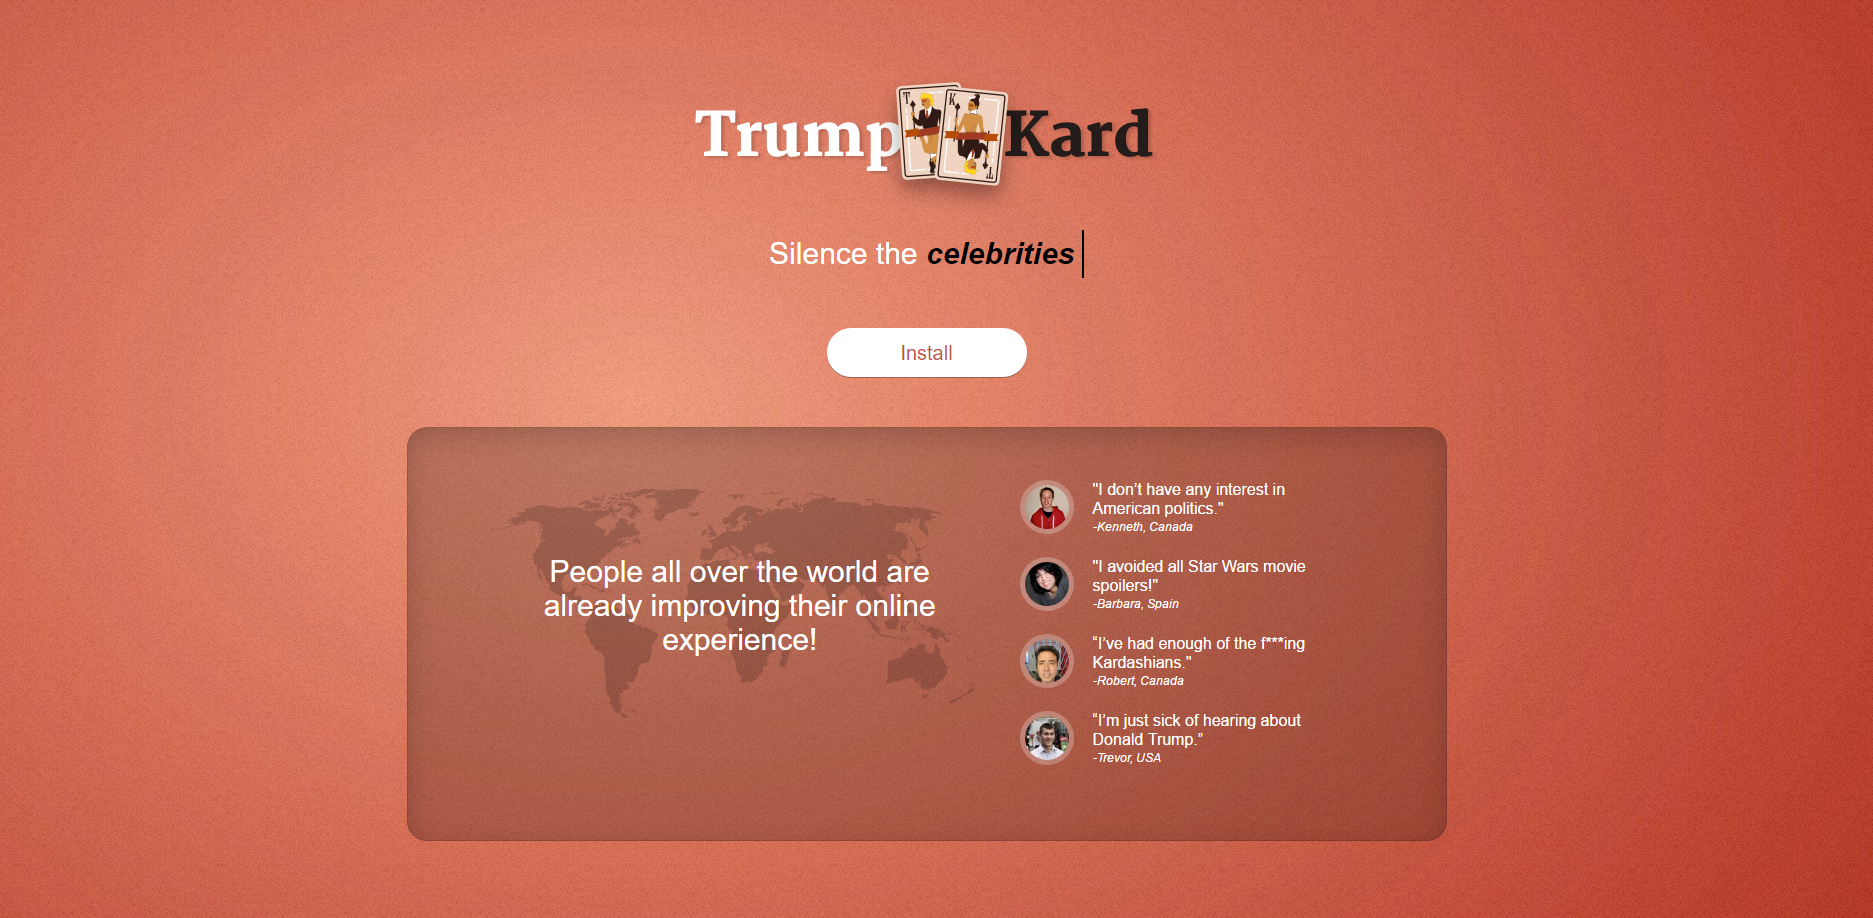 Trump Kard App Ads